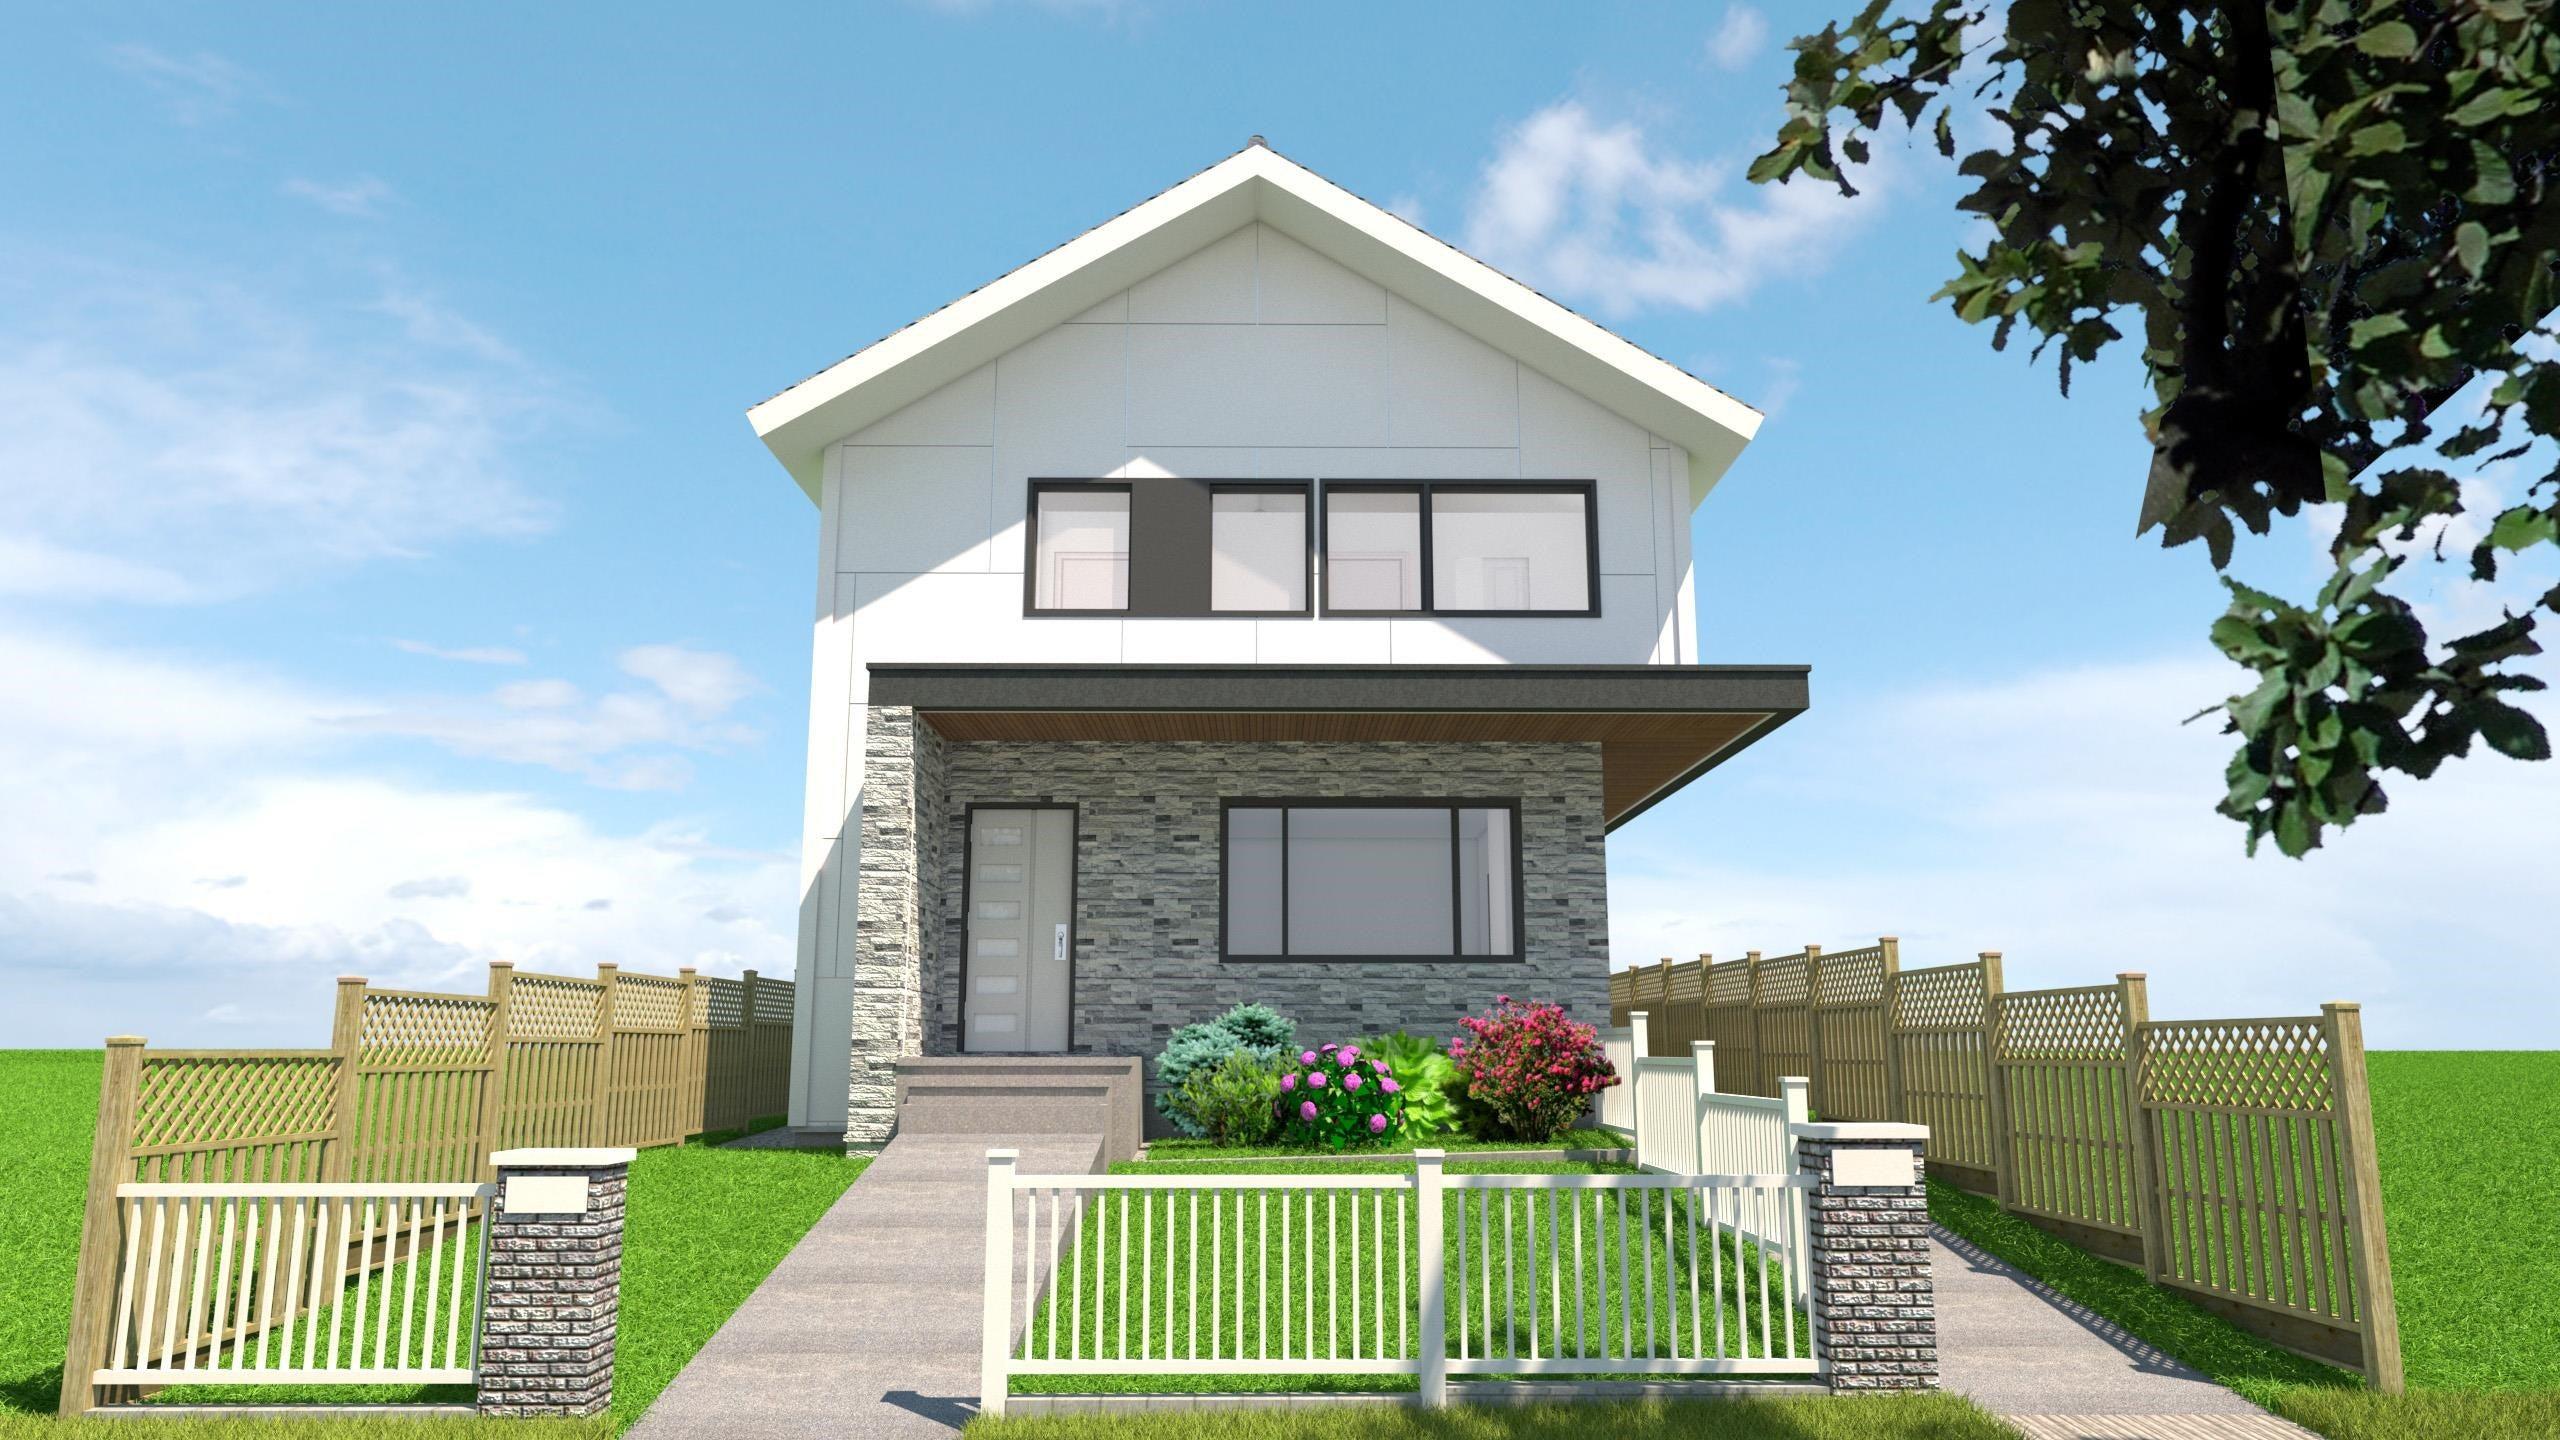 SL #2 2465 E 23RD AVENUE - Renfrew Heights 1/2 Duplex for sale, 3 Bedrooms (R2622267) - #1